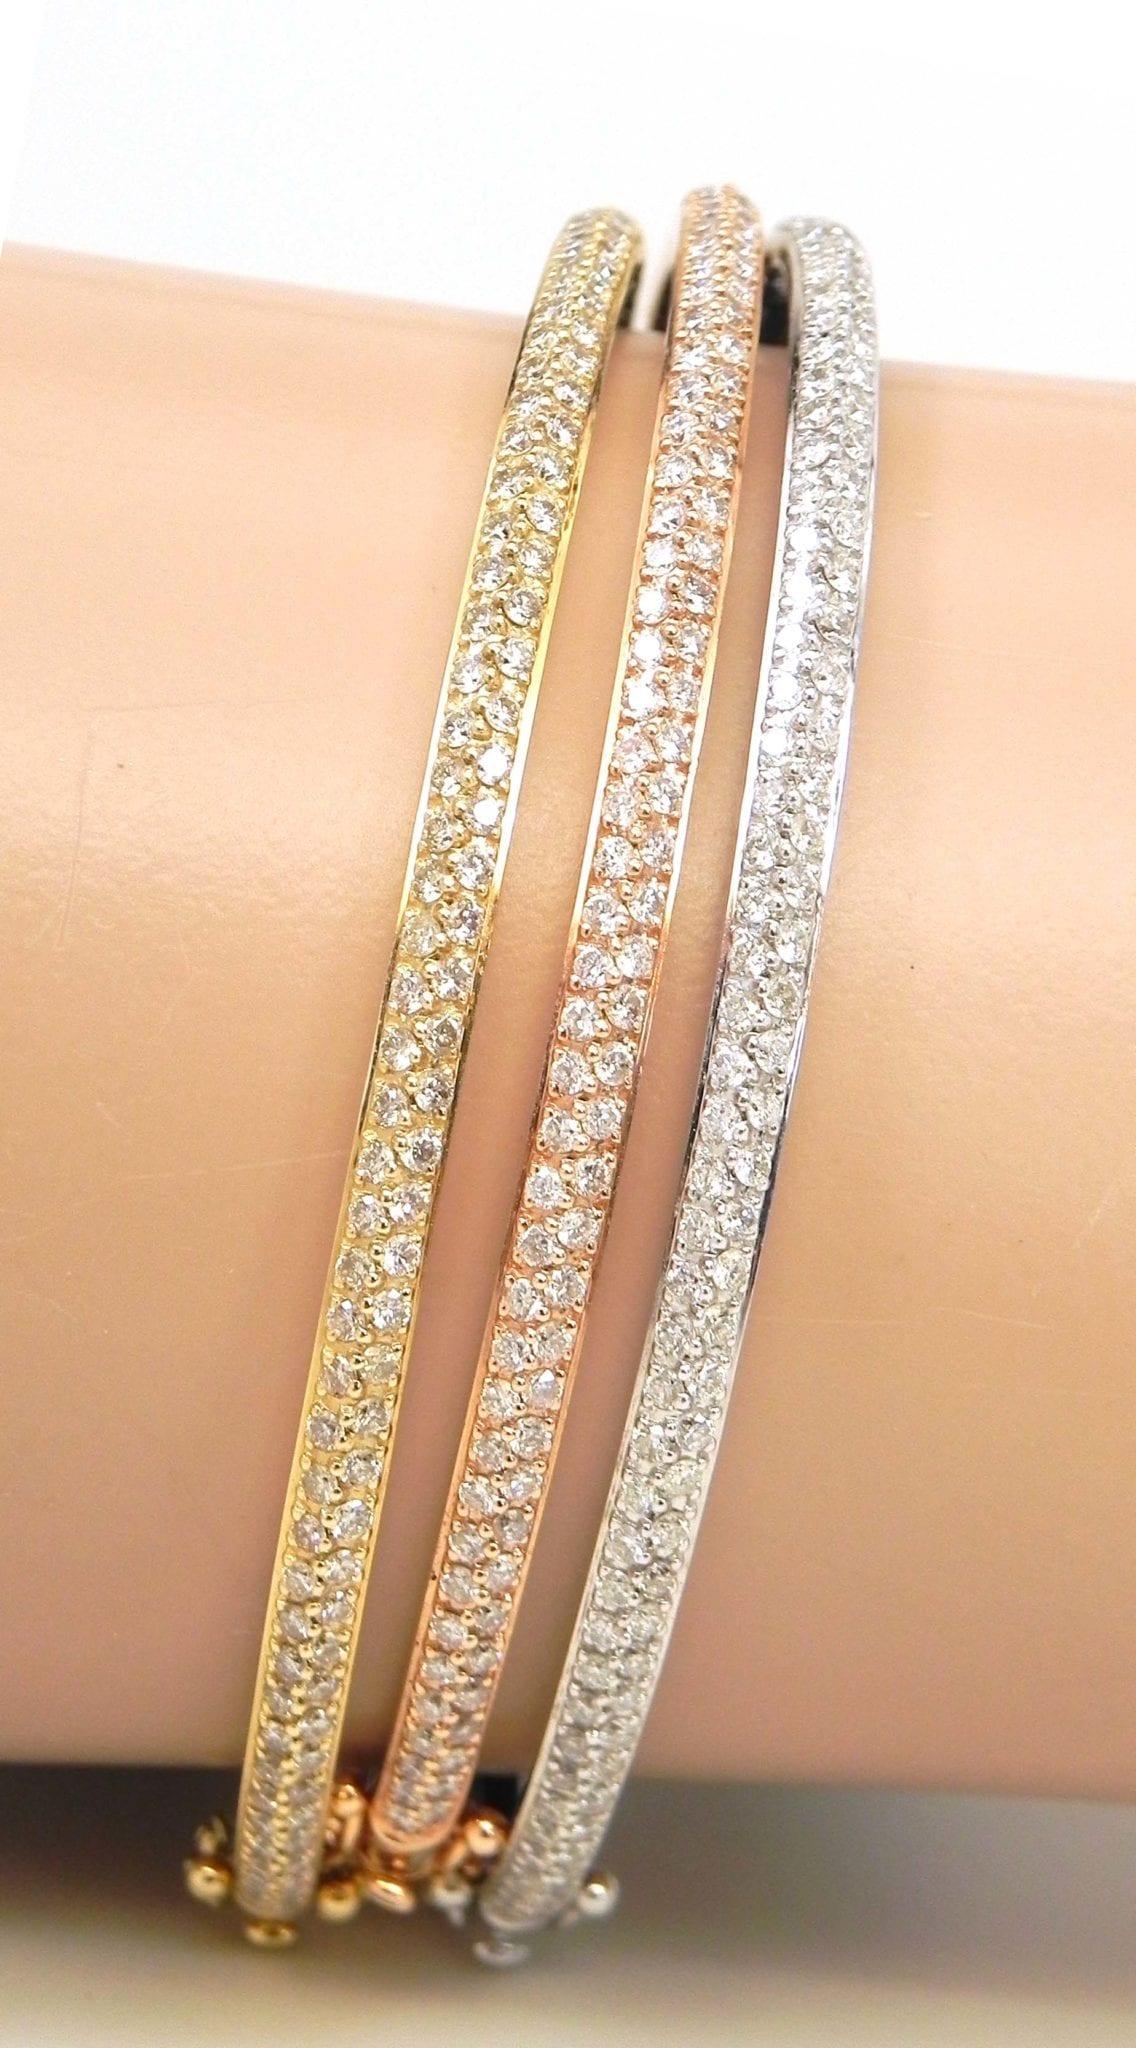 Ebay Diamond Weding Rings 016 - Ebay Diamond Weding Rings